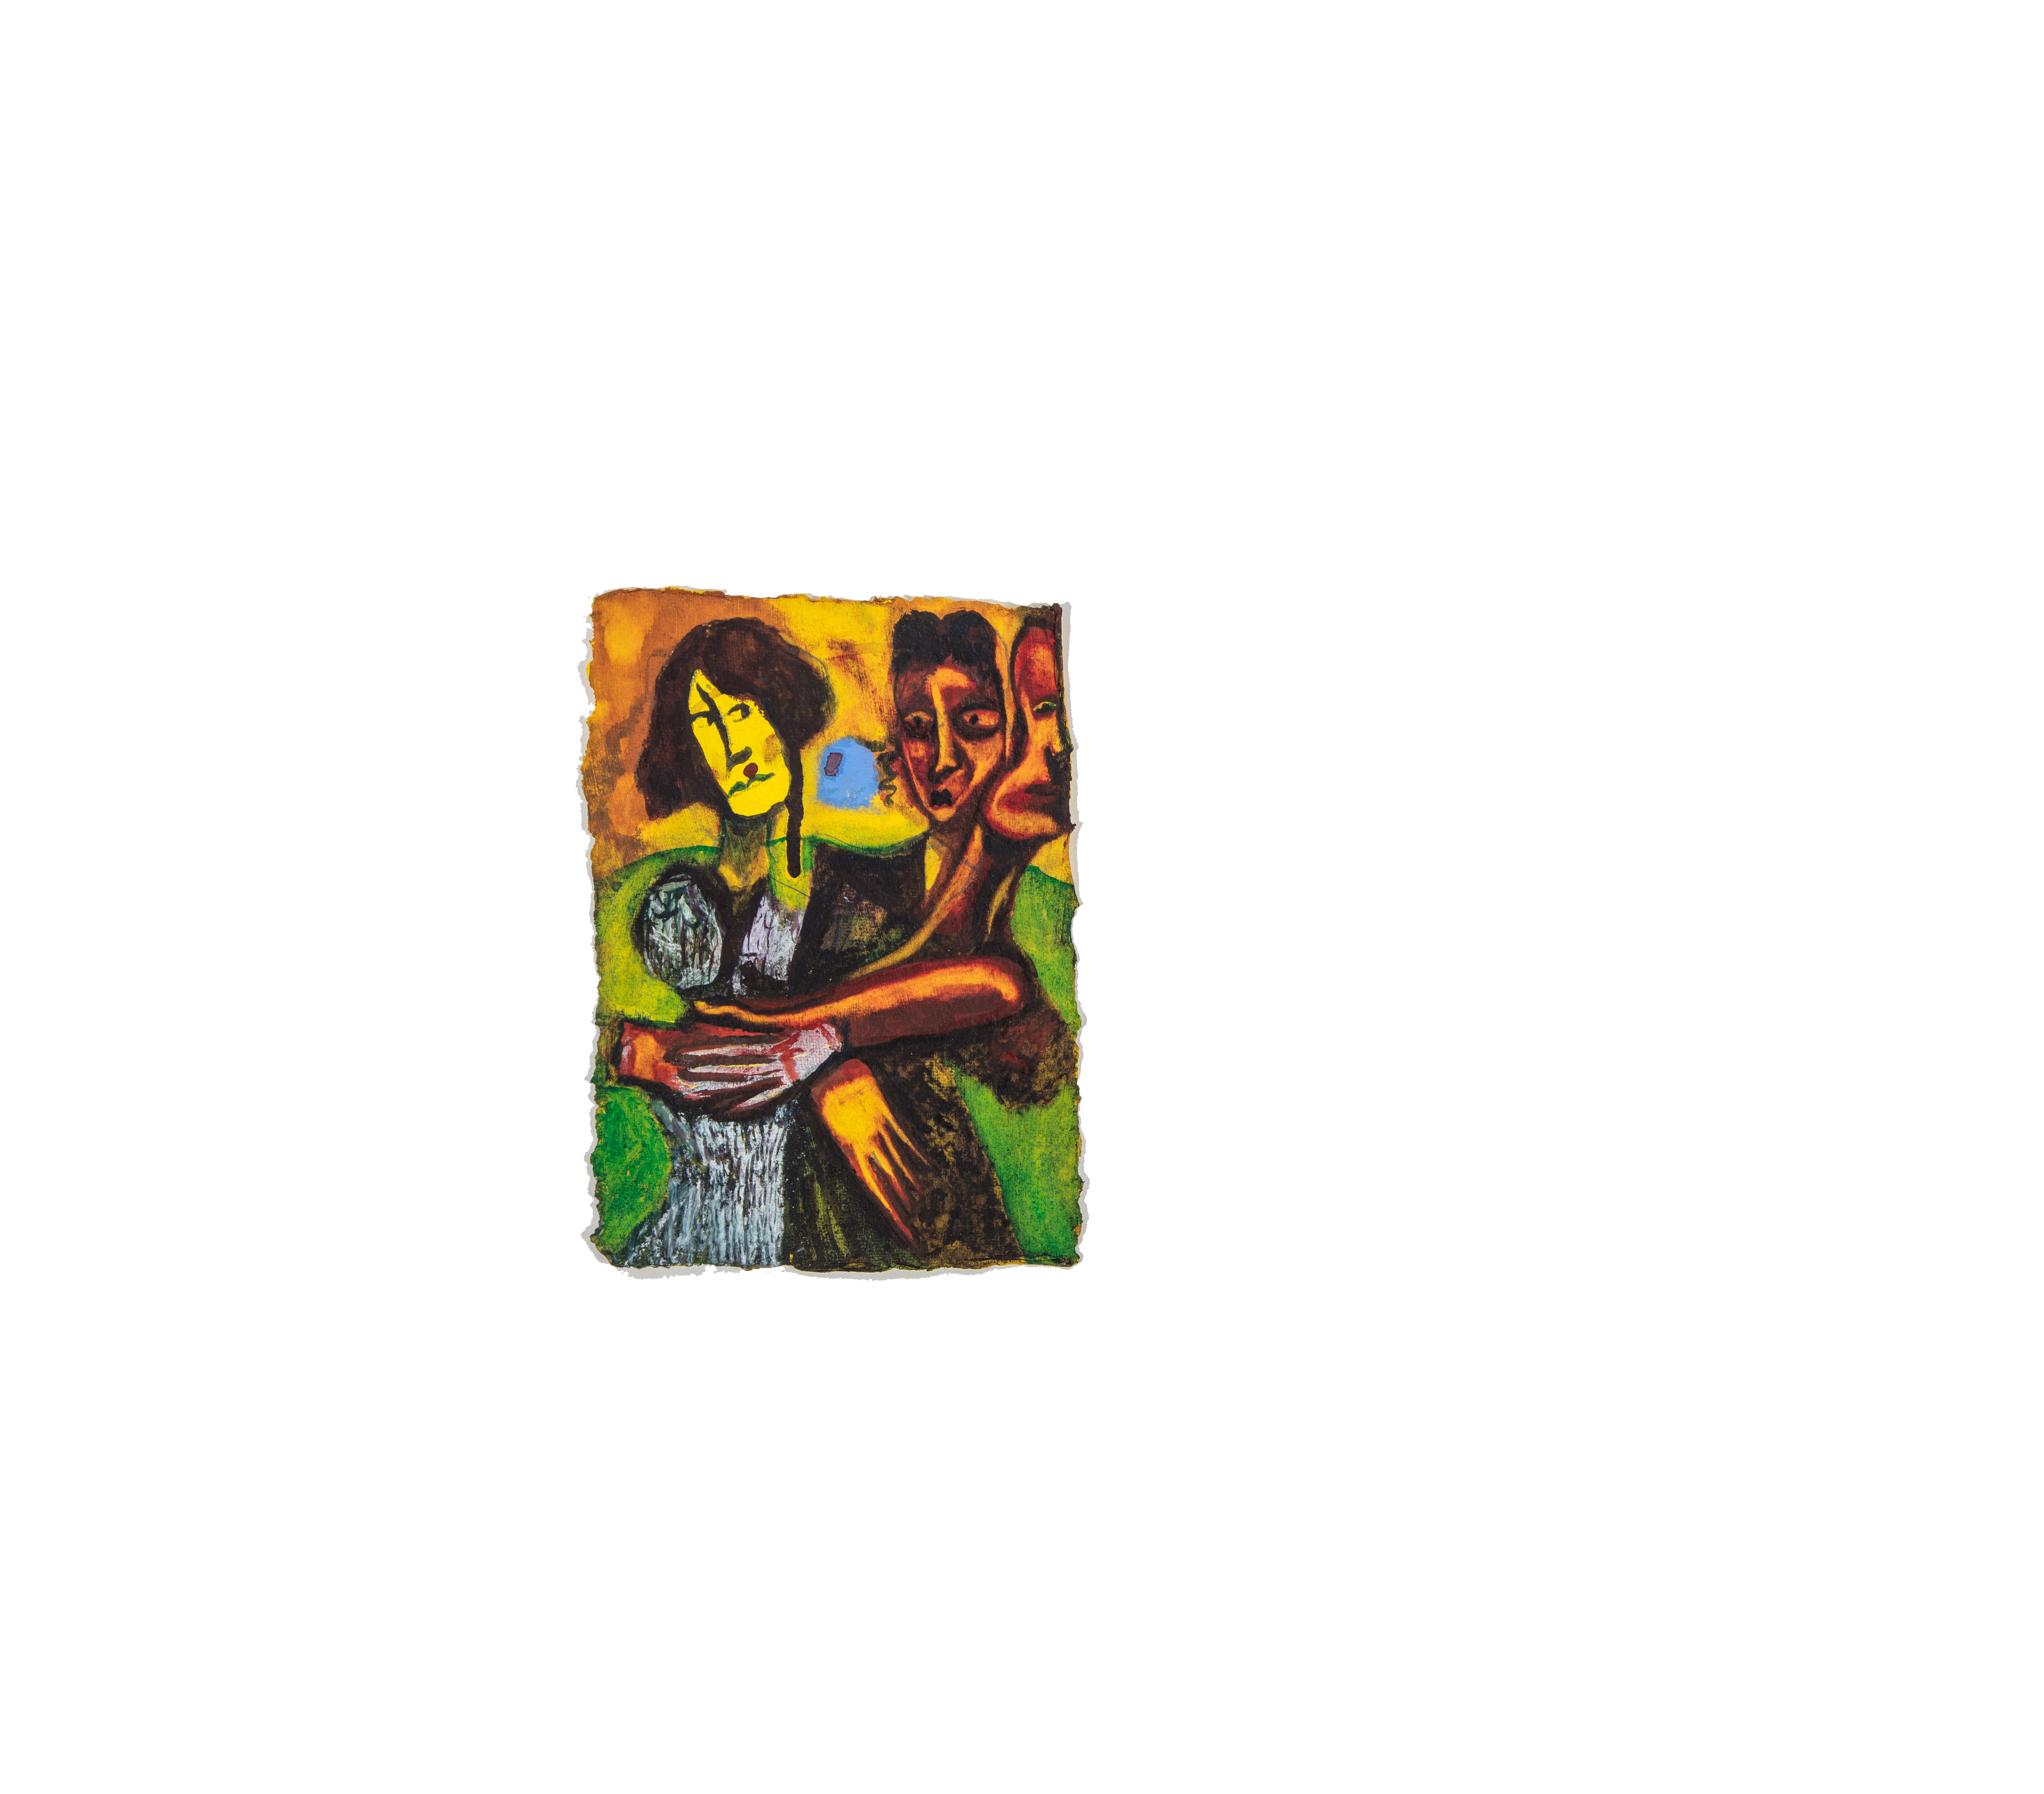 split. Watercolour on handmade paper, 14cm x 20cm